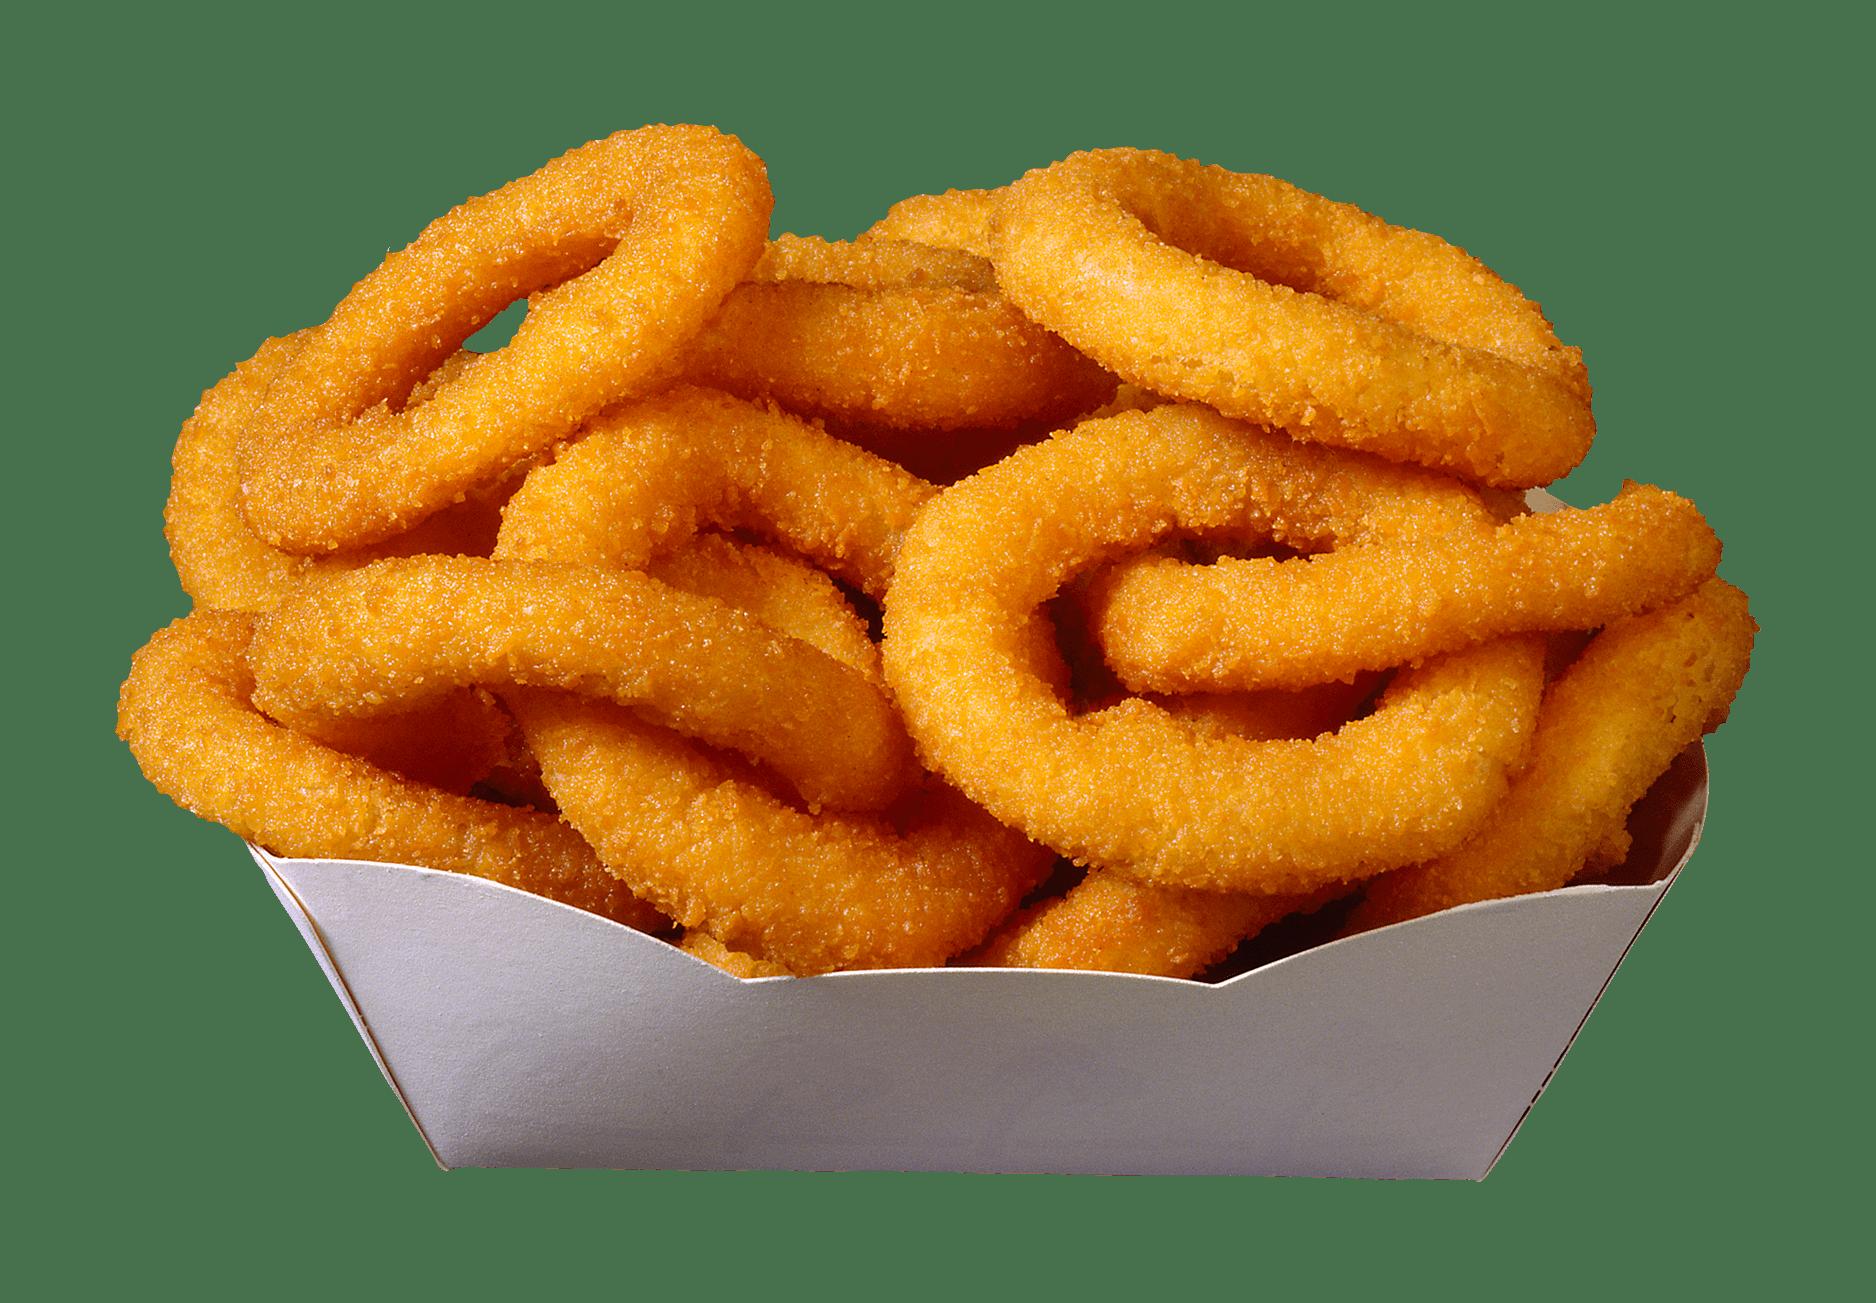 Onion rings (10 pcs)